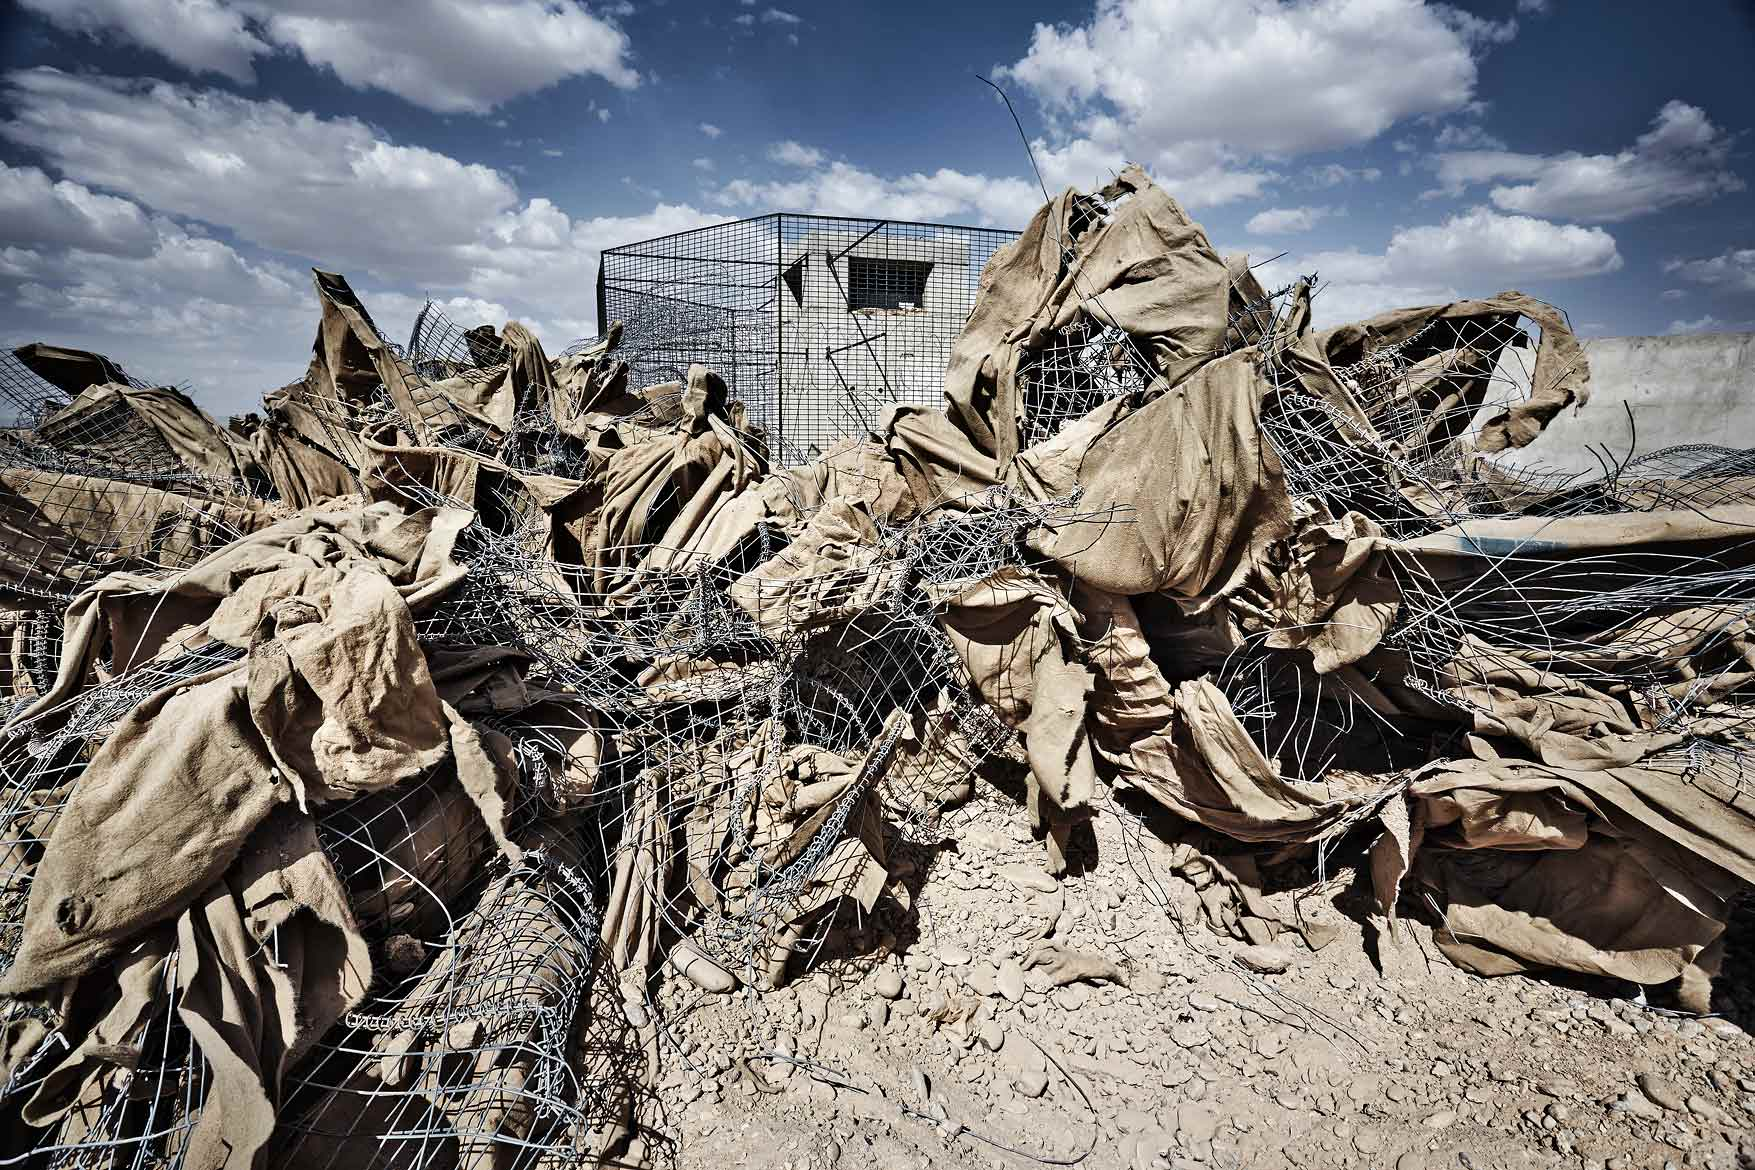 7.2014_Afghanistan__MG_2363.flat copy.jpg